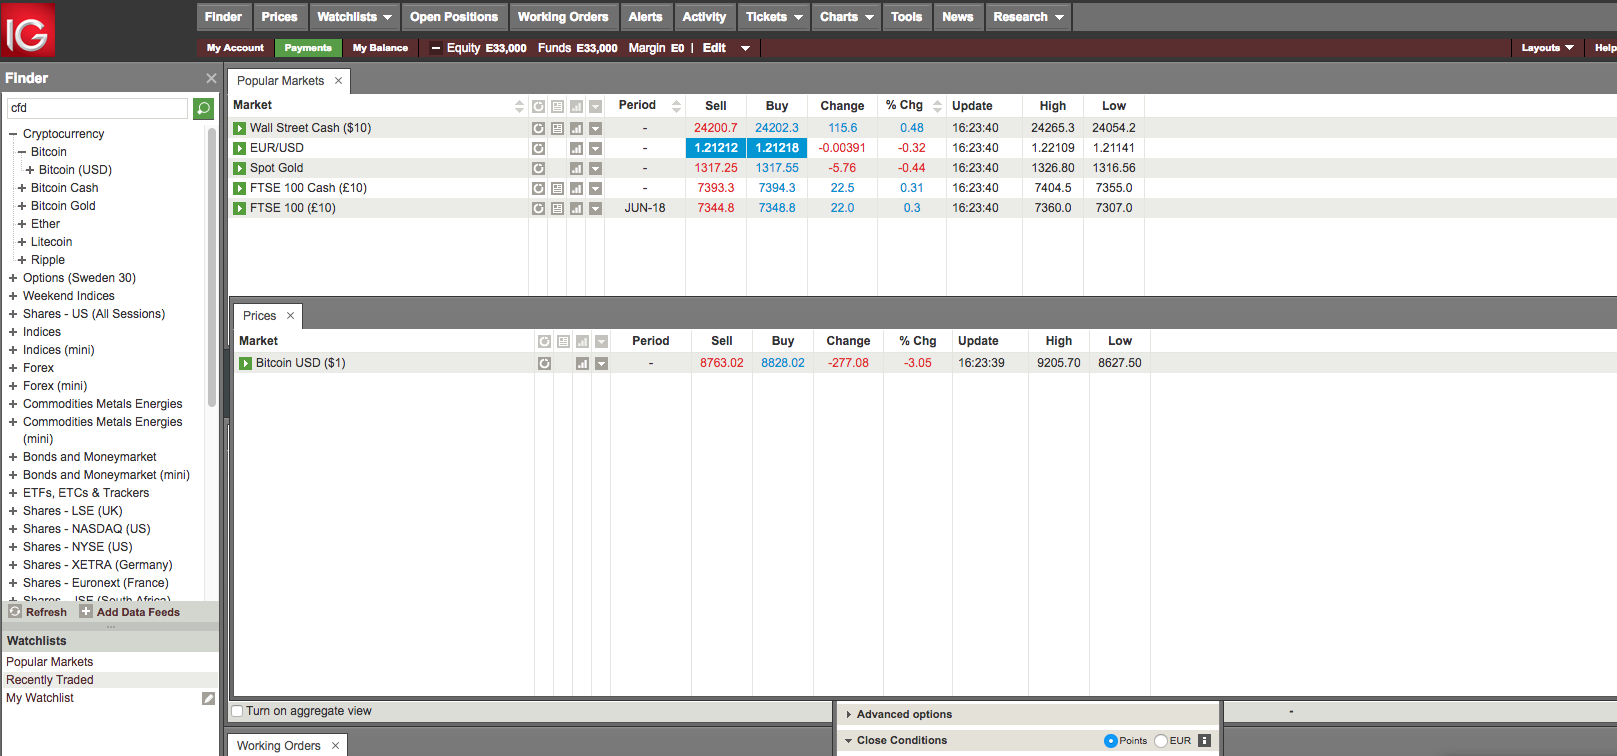 ESMA CFD intervention new regulation - Interactive Brokers - Web trading platform